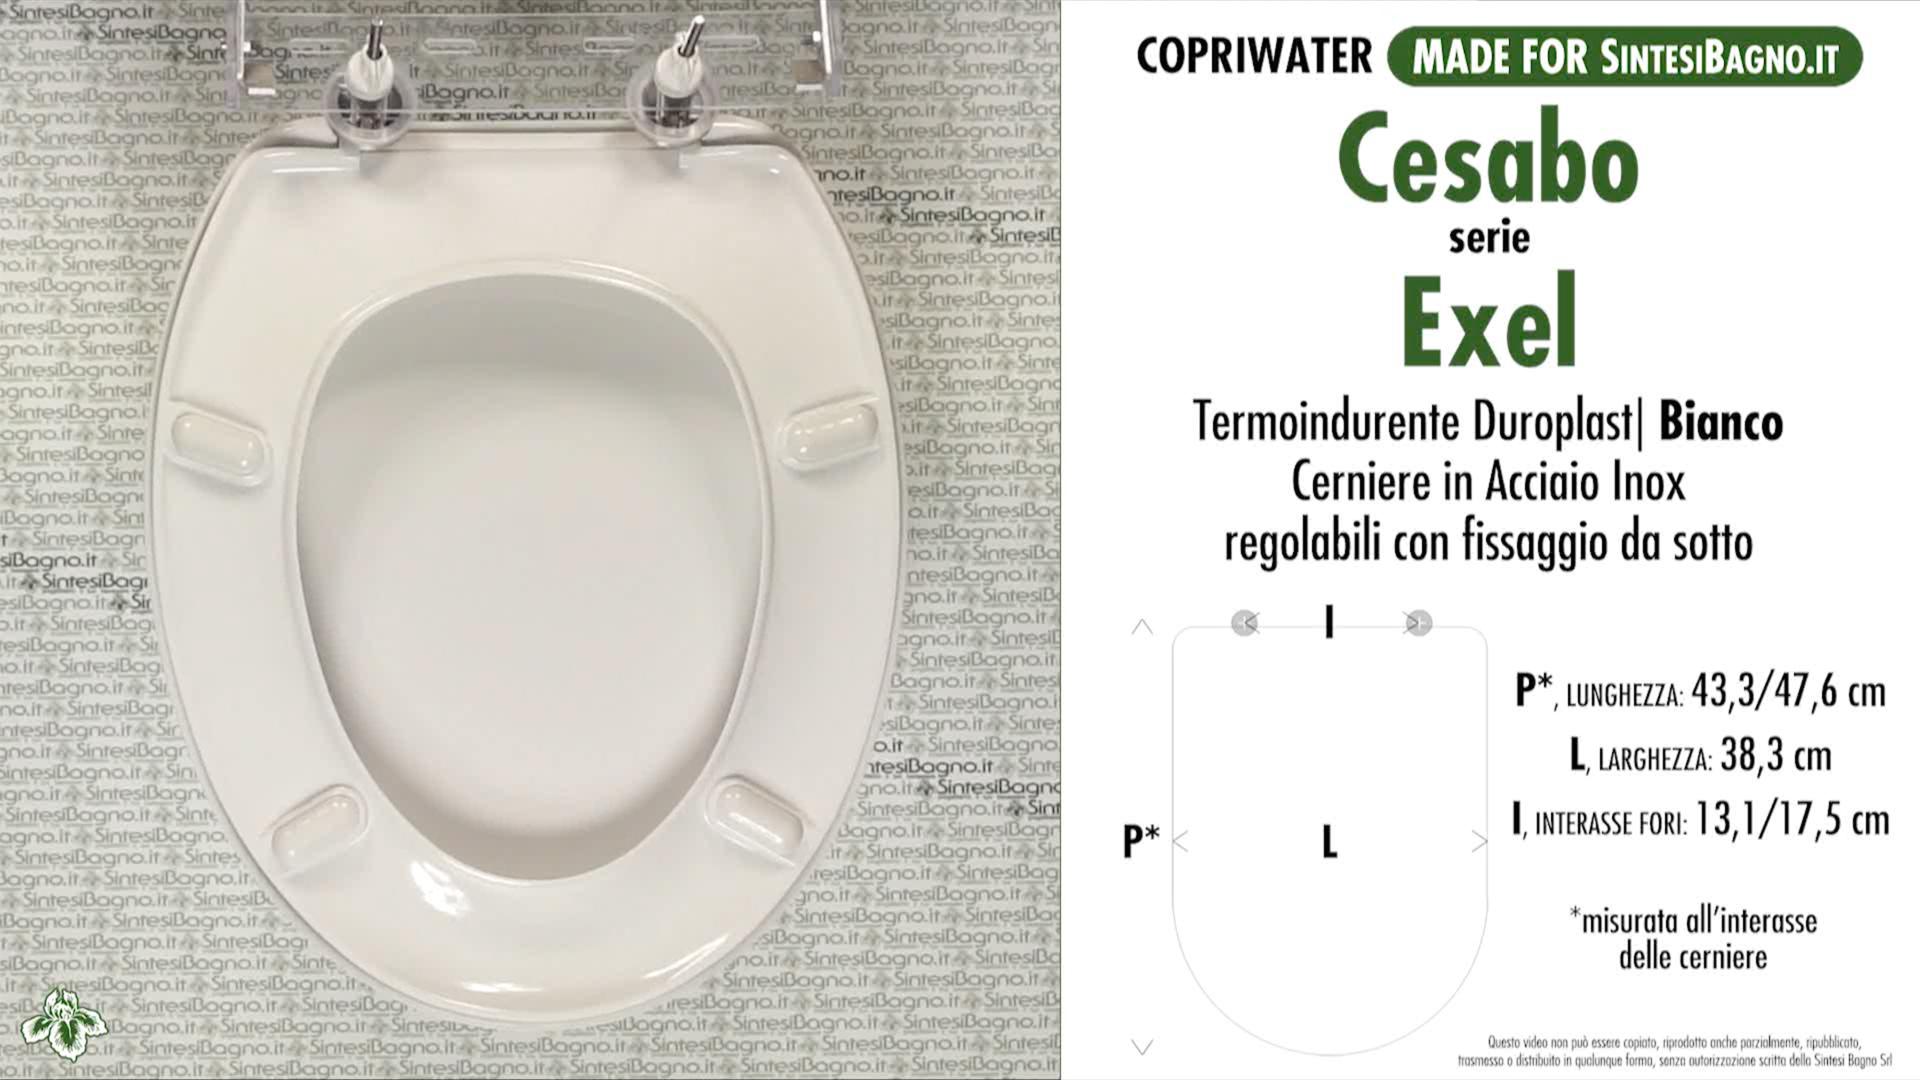 SCHEDA TECNICA MISURE copriwater CESABO EXEL